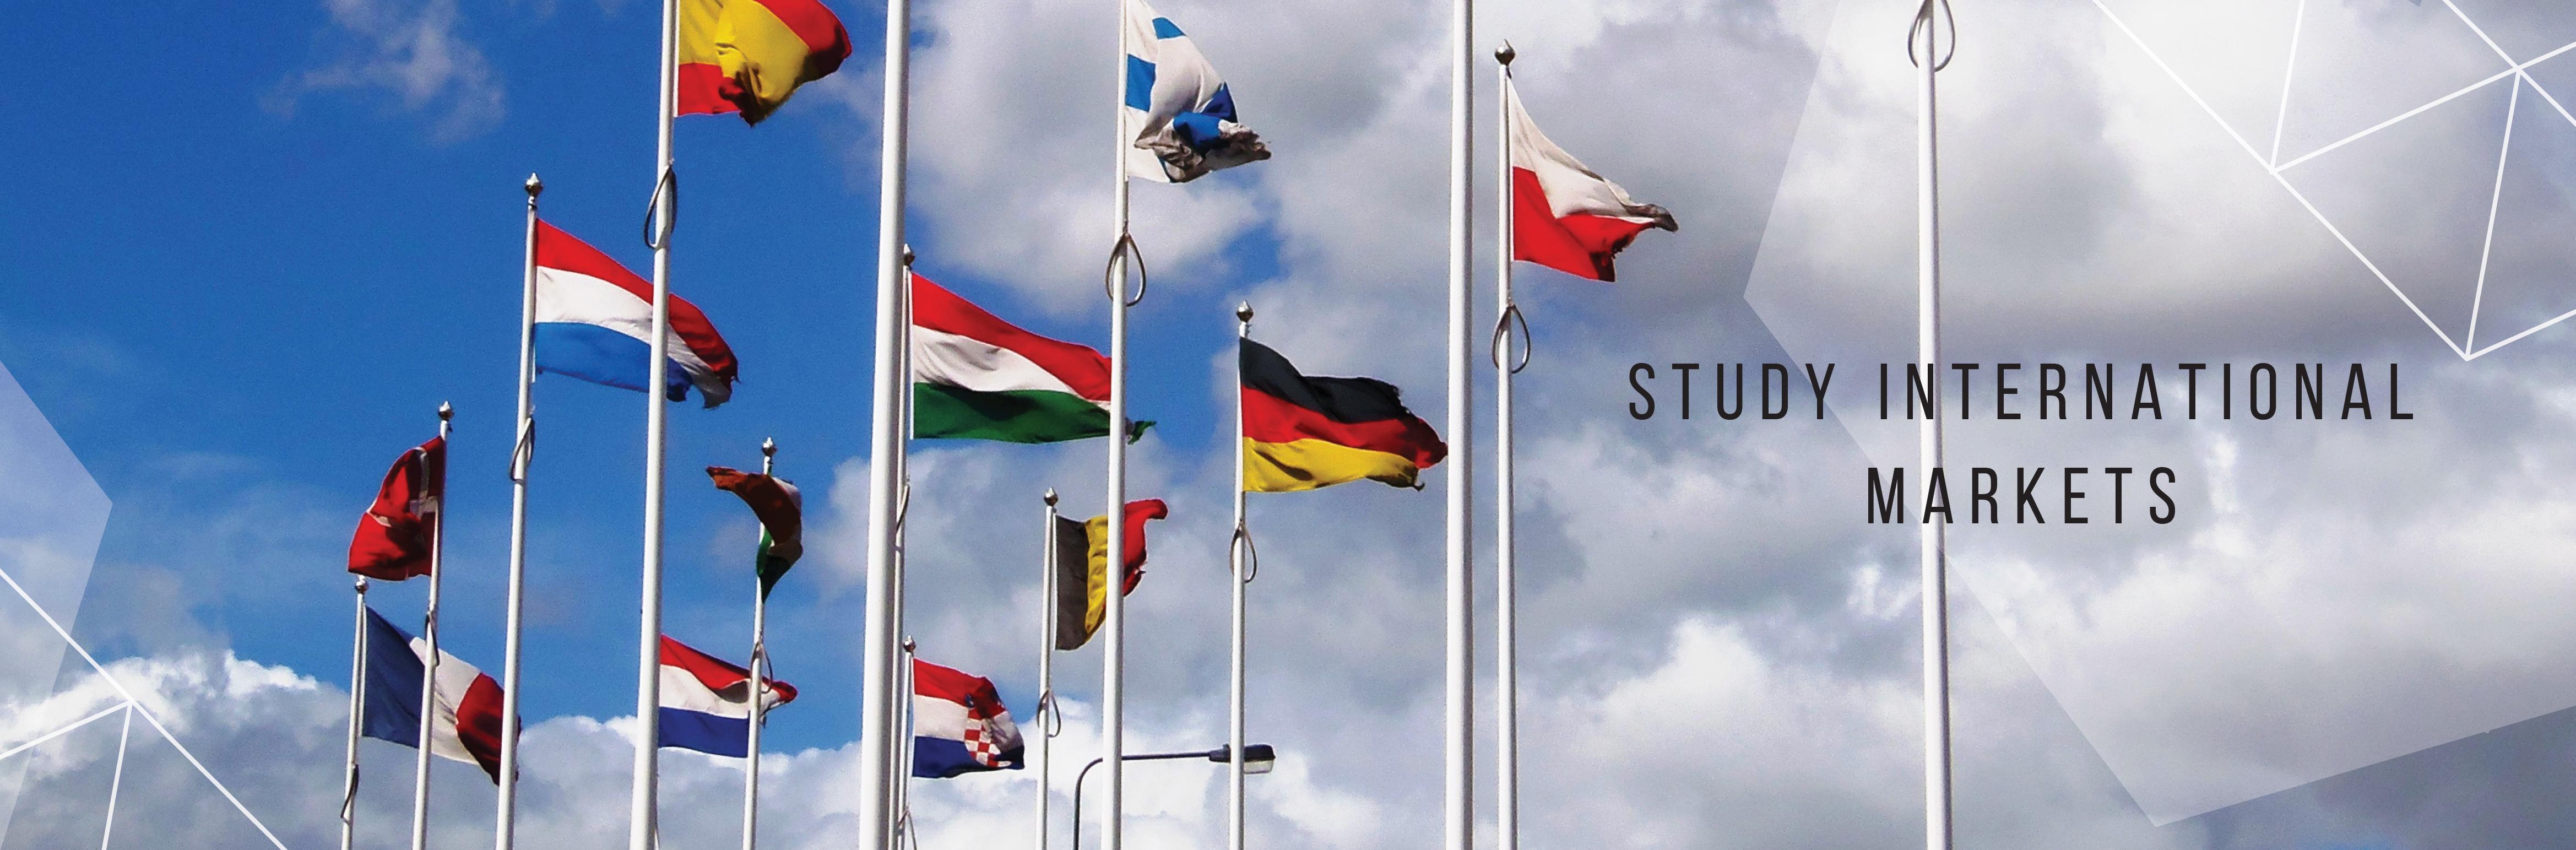 international-markets-banner